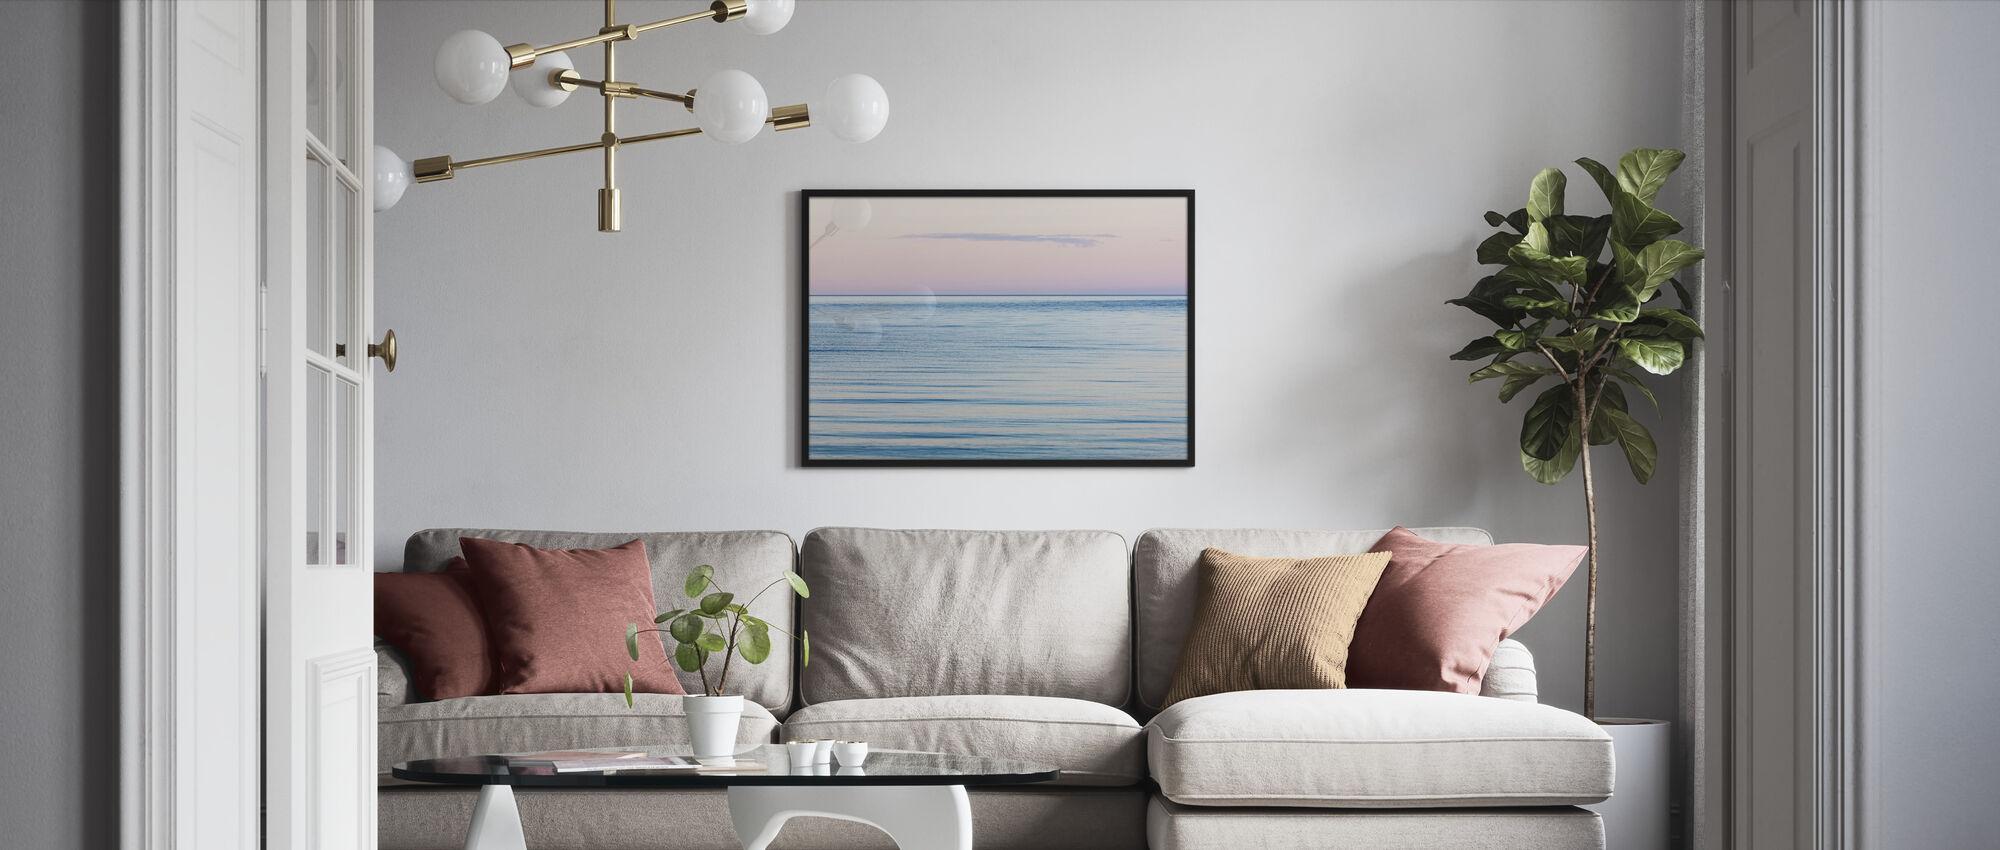 Pink and Blue Dream - Framed print - Living Room